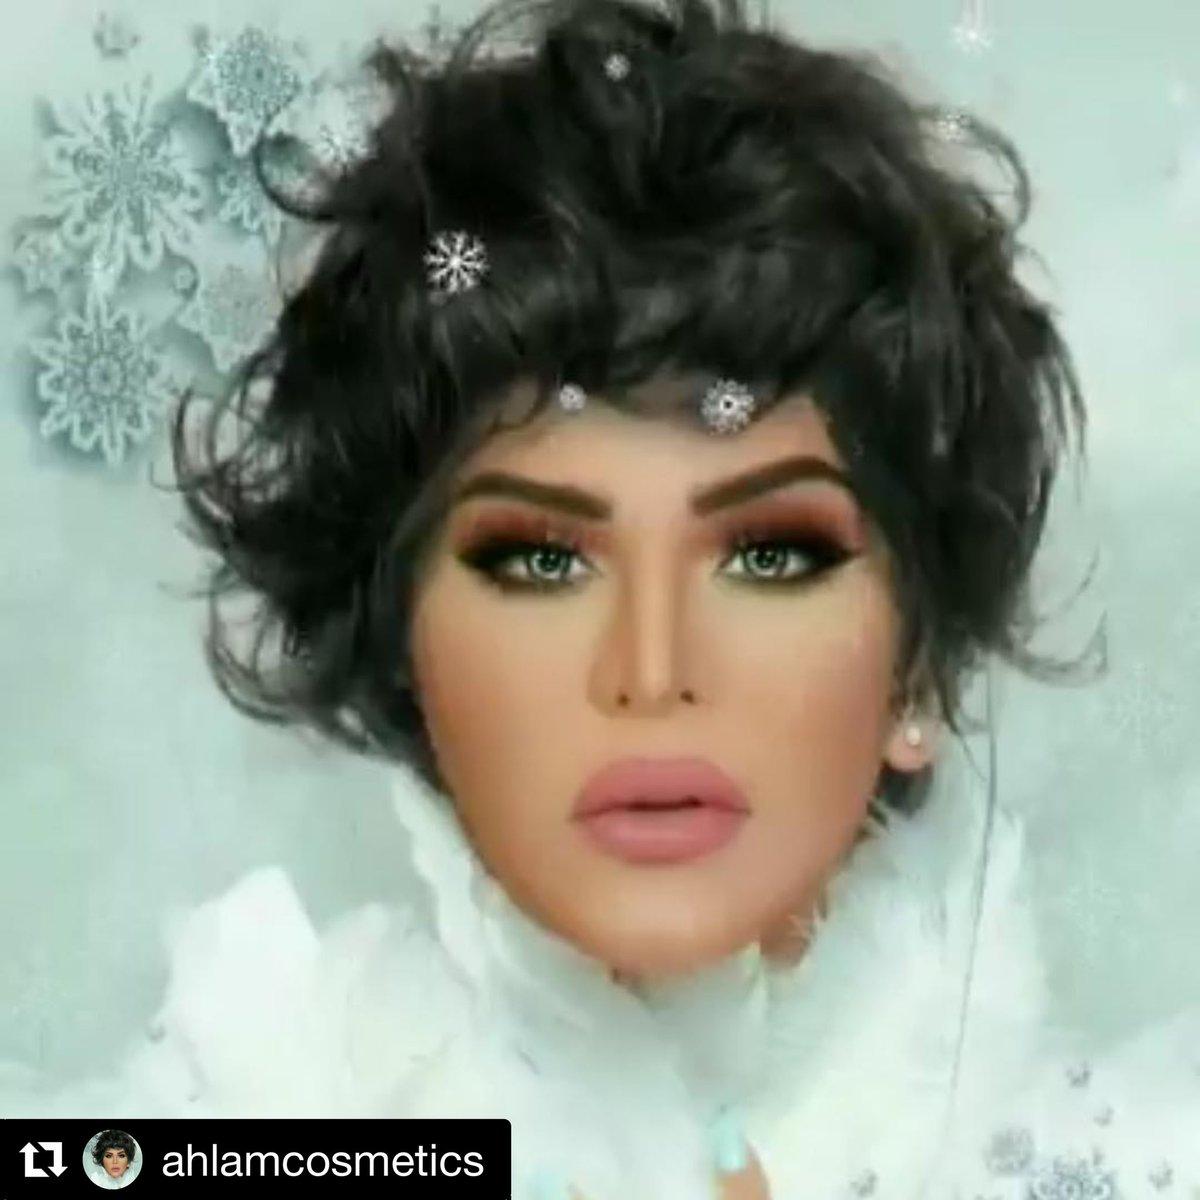 #follow #me 👑👸🏻🙏🏻🌹 in my #Instagram #ahlamcosmetic 😘